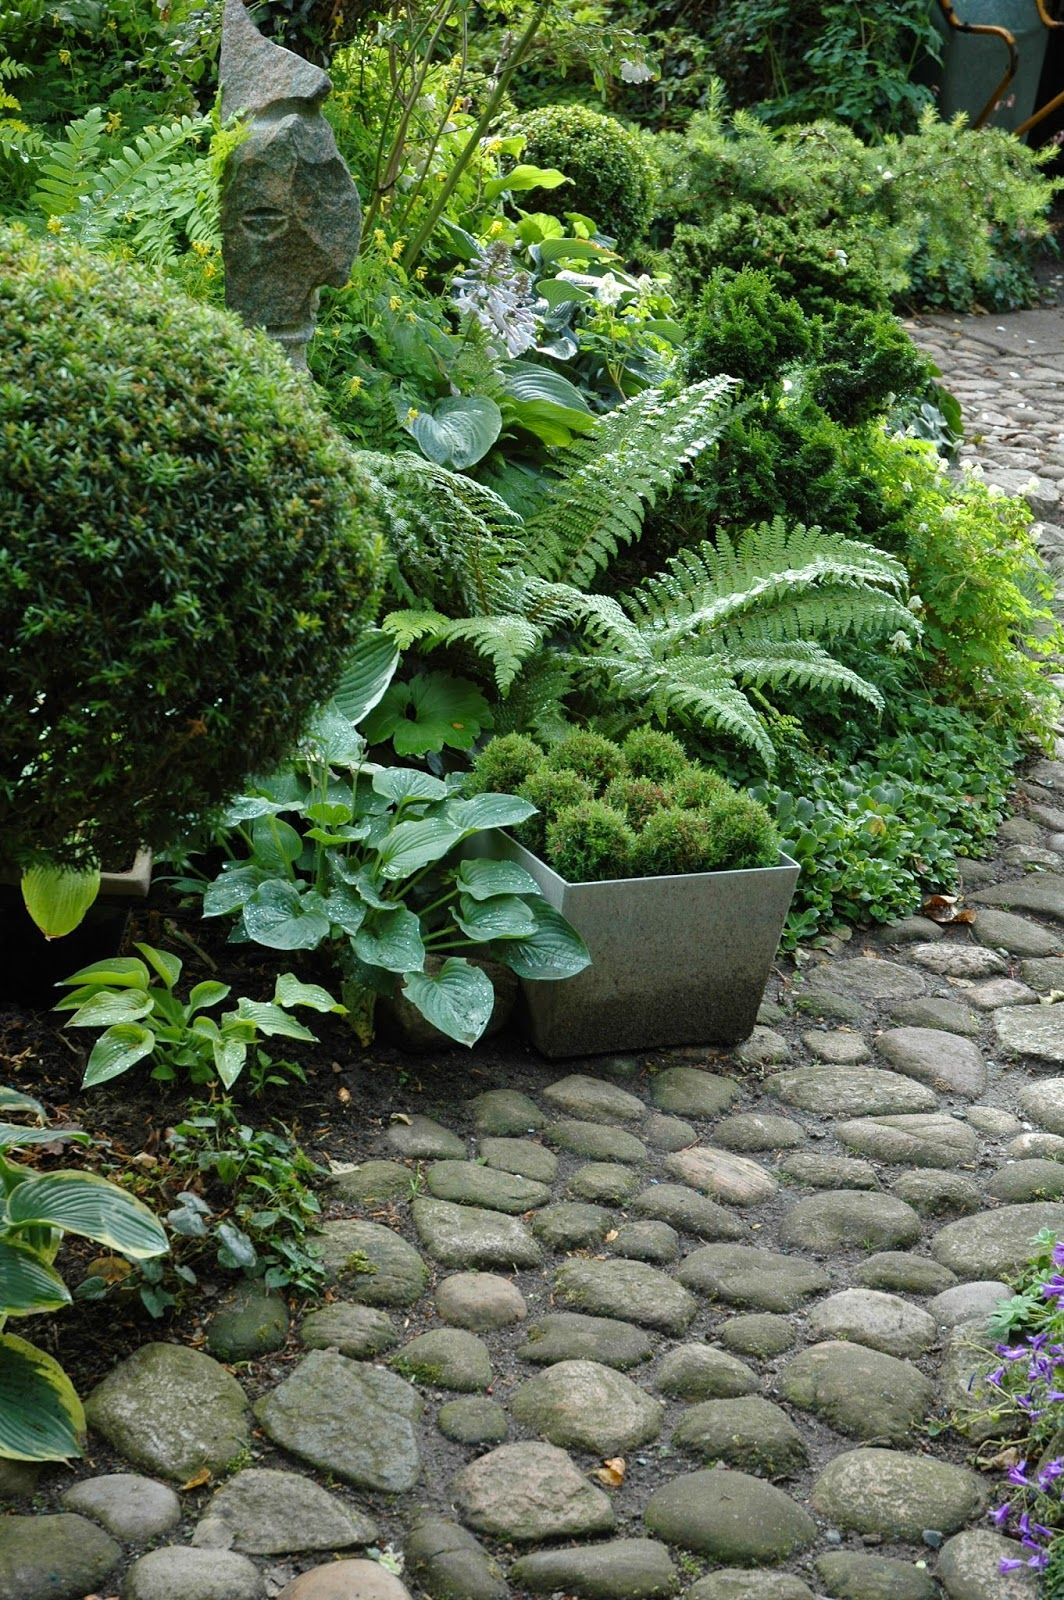 Schattengarten garten sitzen pinterest for Naturnaher garten anlegen